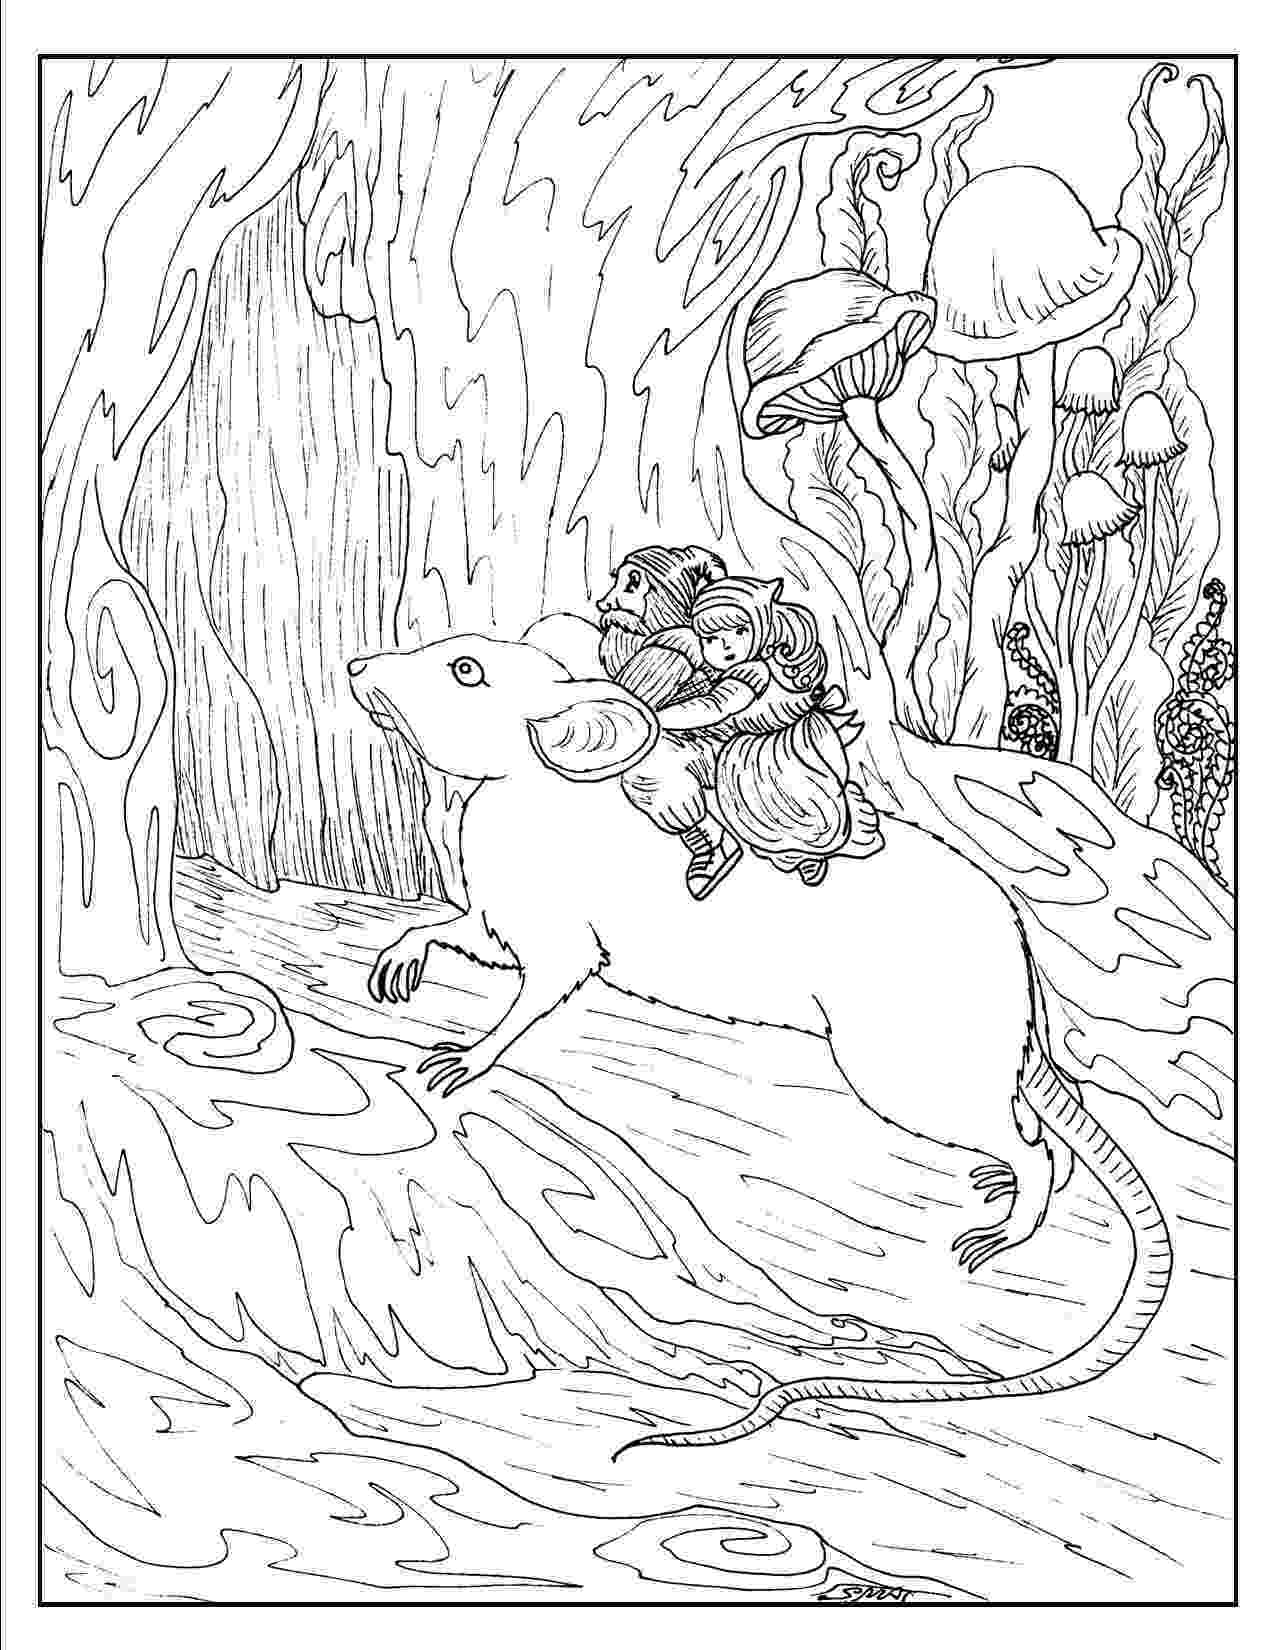 coloring pages fantasy fantasy coloring pages smac39s place to be coloring pages fantasy 1 1